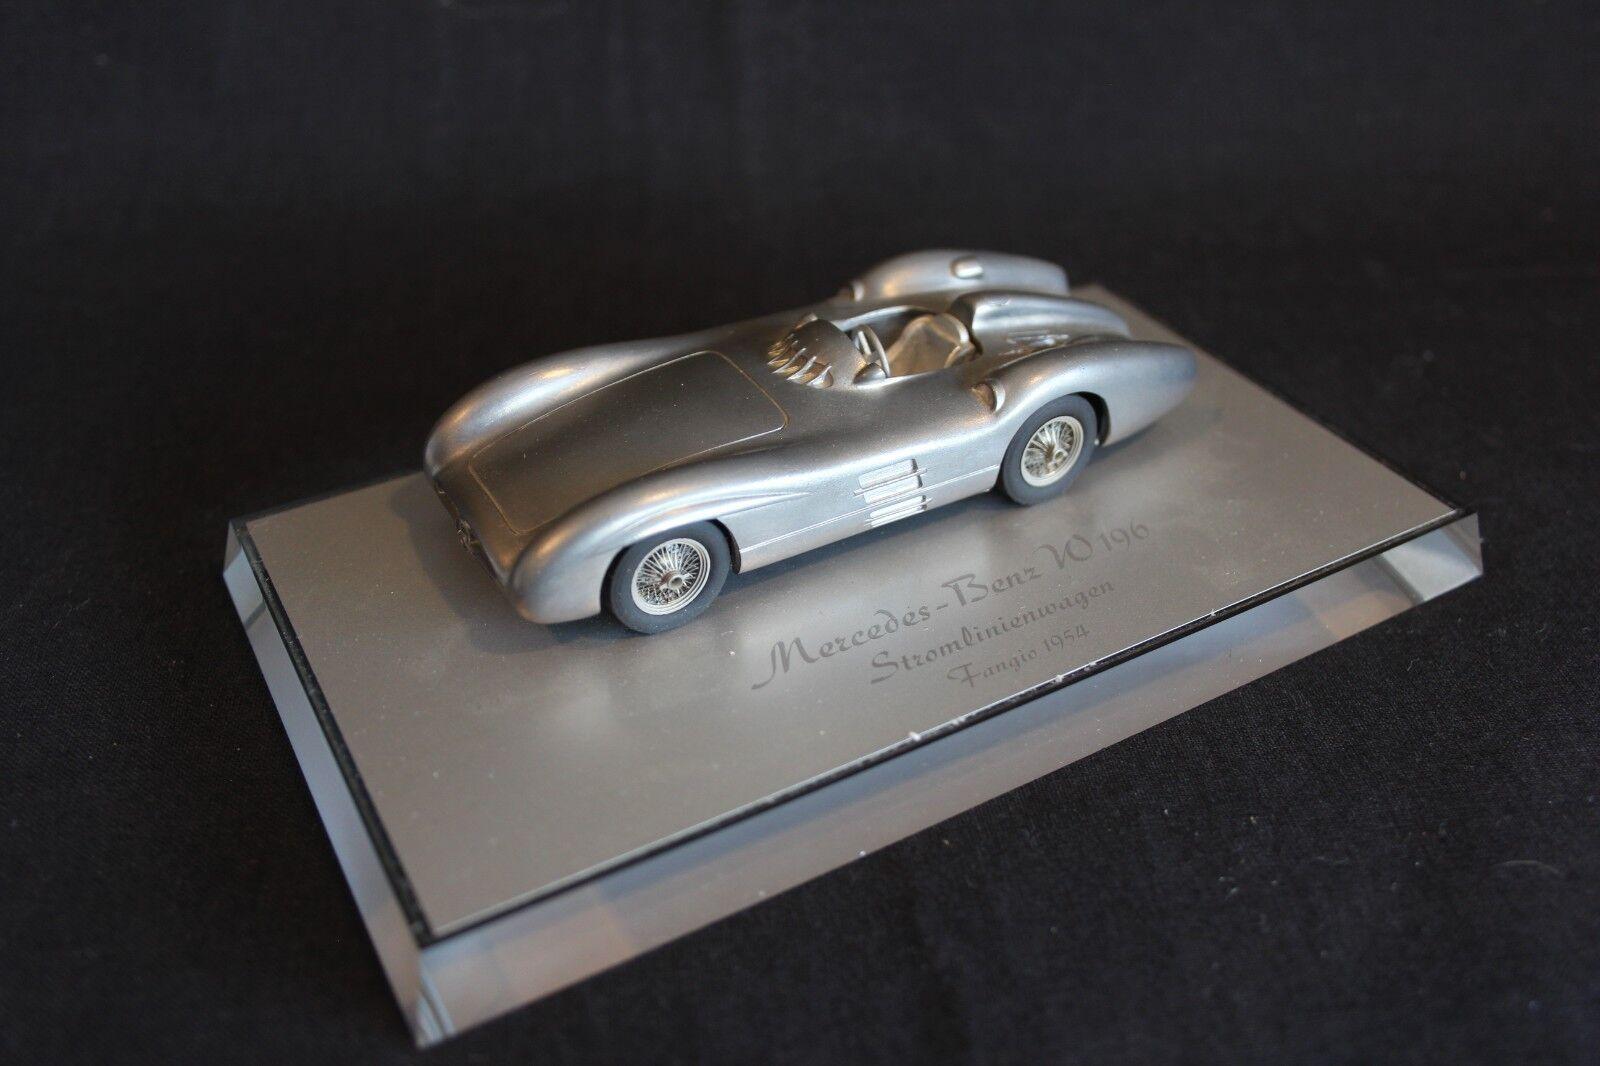 AMR Mercedes-Benz W196 Stromlinienwagen 1954 1:43 Juan Manuel Manuel Manuel Fangio  ARG   JS  e805f0